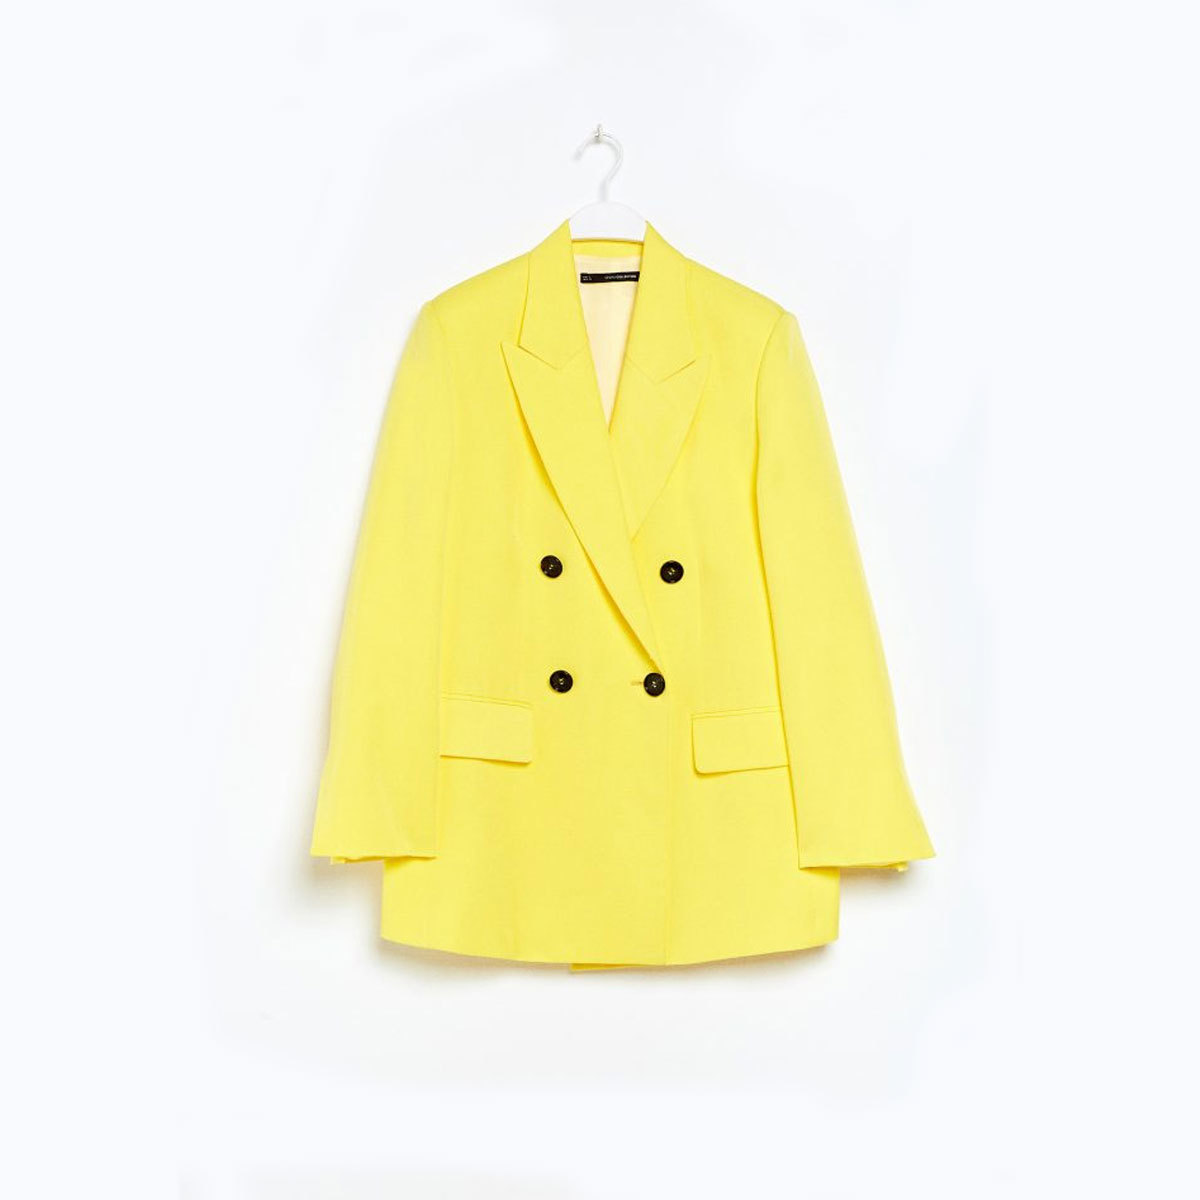 Chaqueta  amarilla con abotonadura, de Sfera (39,99 euros).